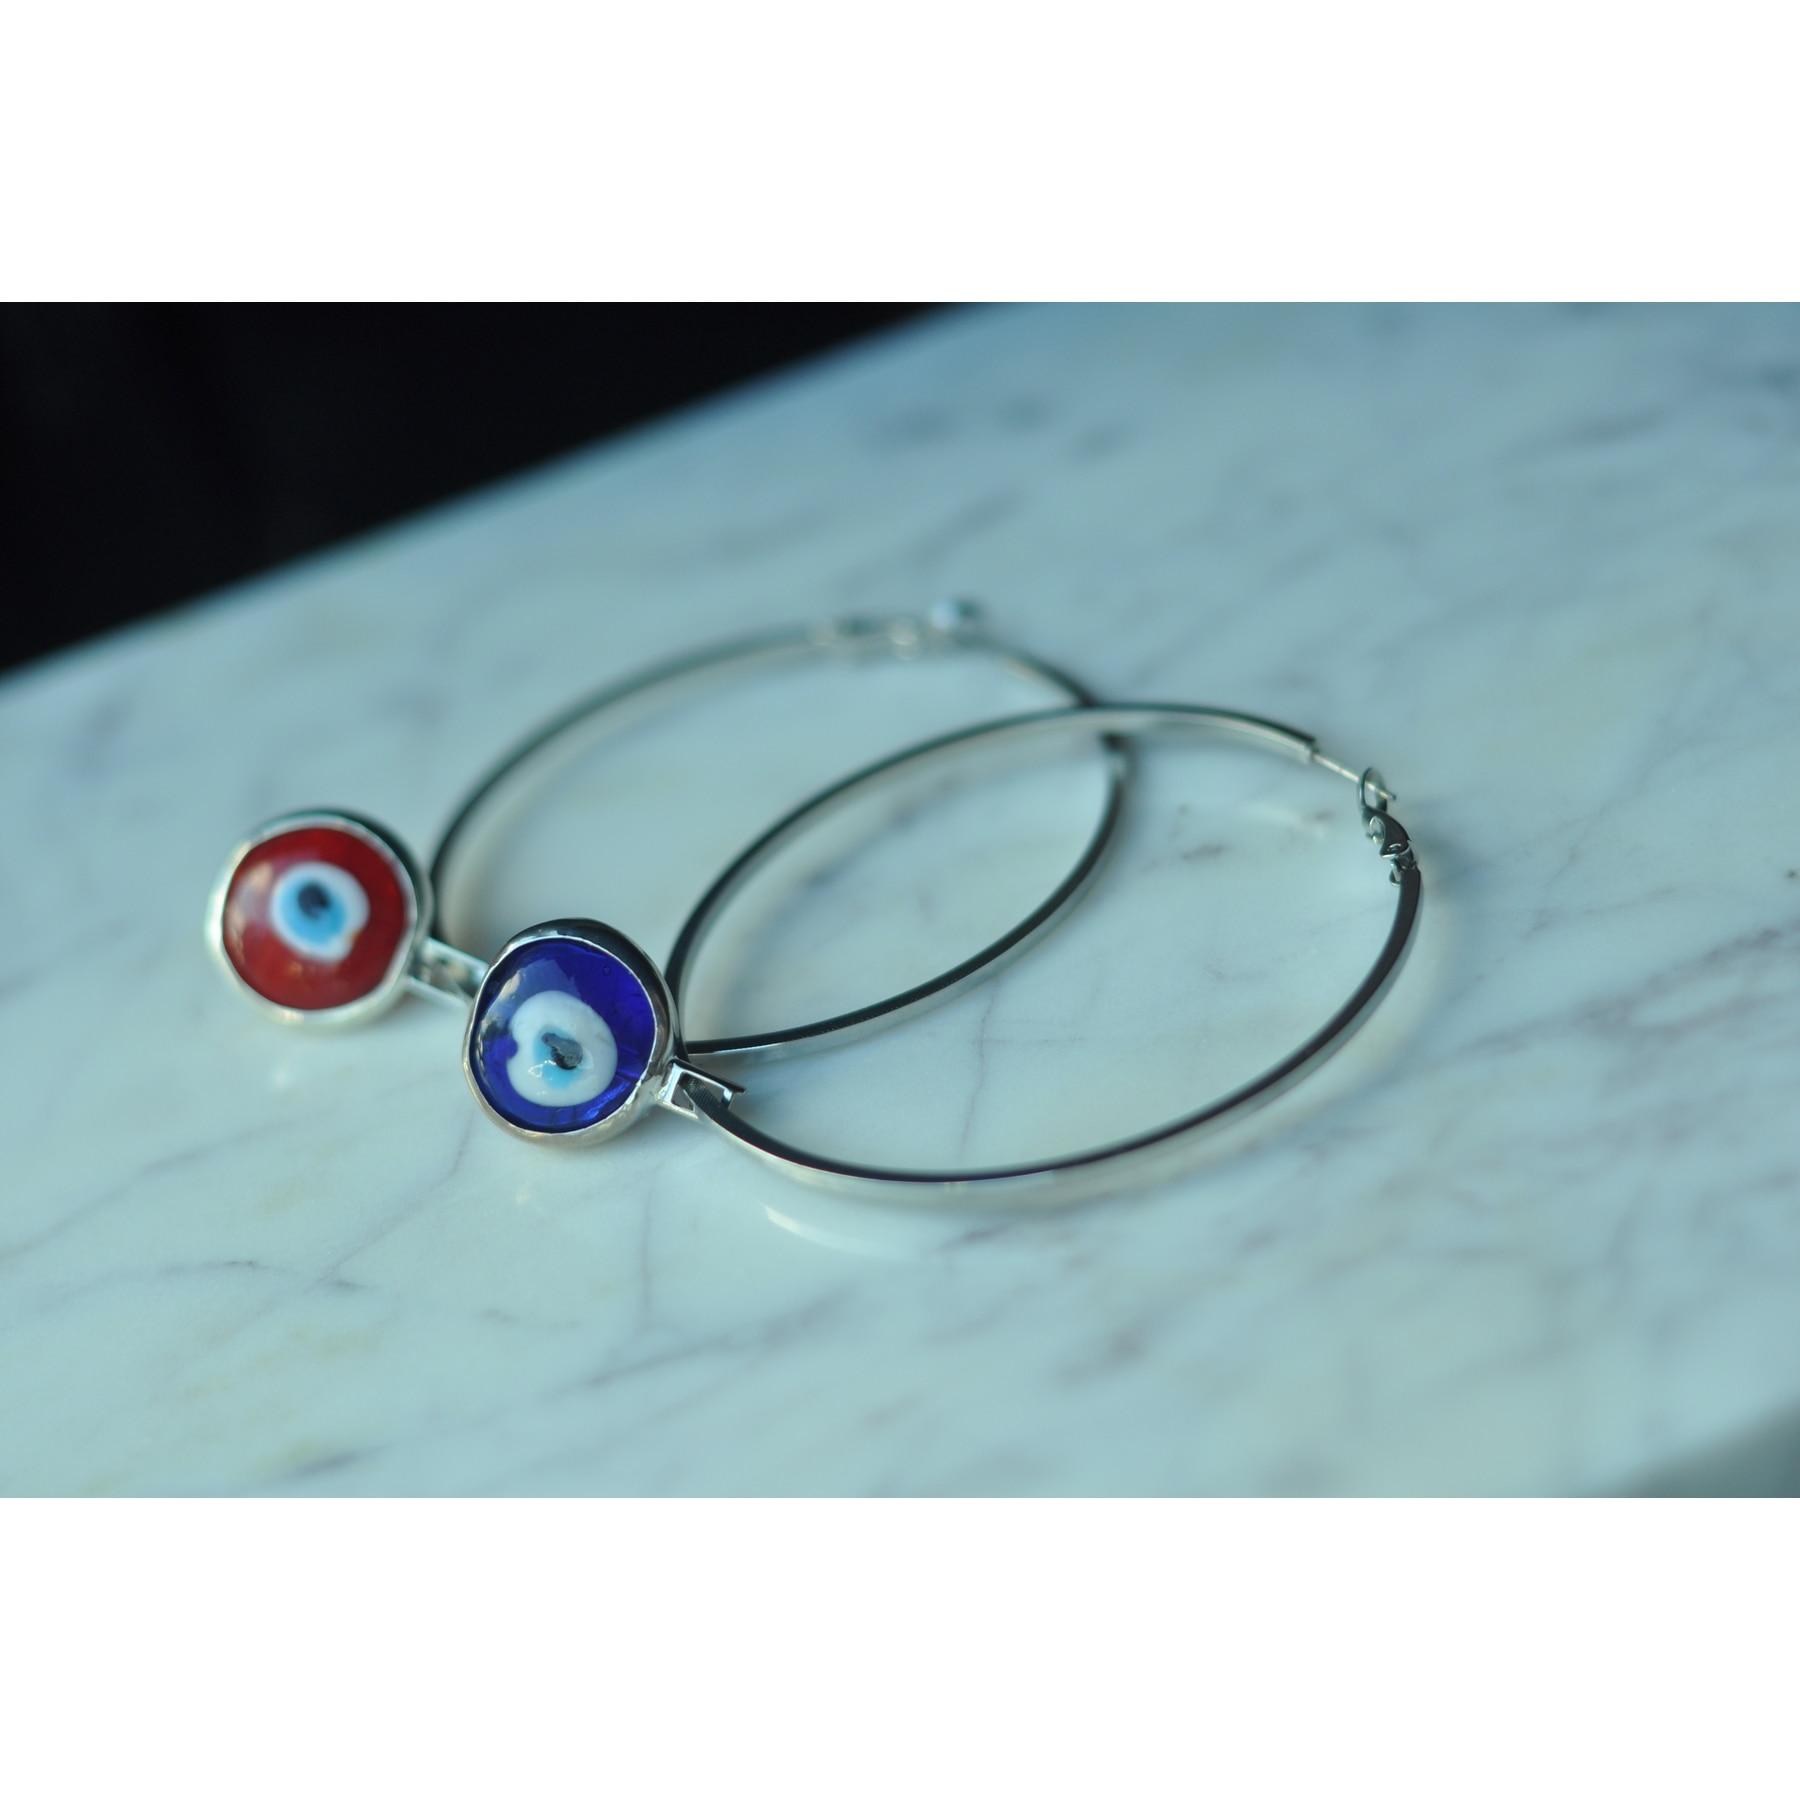 GULCE DERELI-أقراط كبيرة على شكل عين الشر باللونين الأزرق والأحمر ، أقراط دائرية ، أقراط ساحرة ، صندوق هدايا ، مطلية بالذهب والفضة